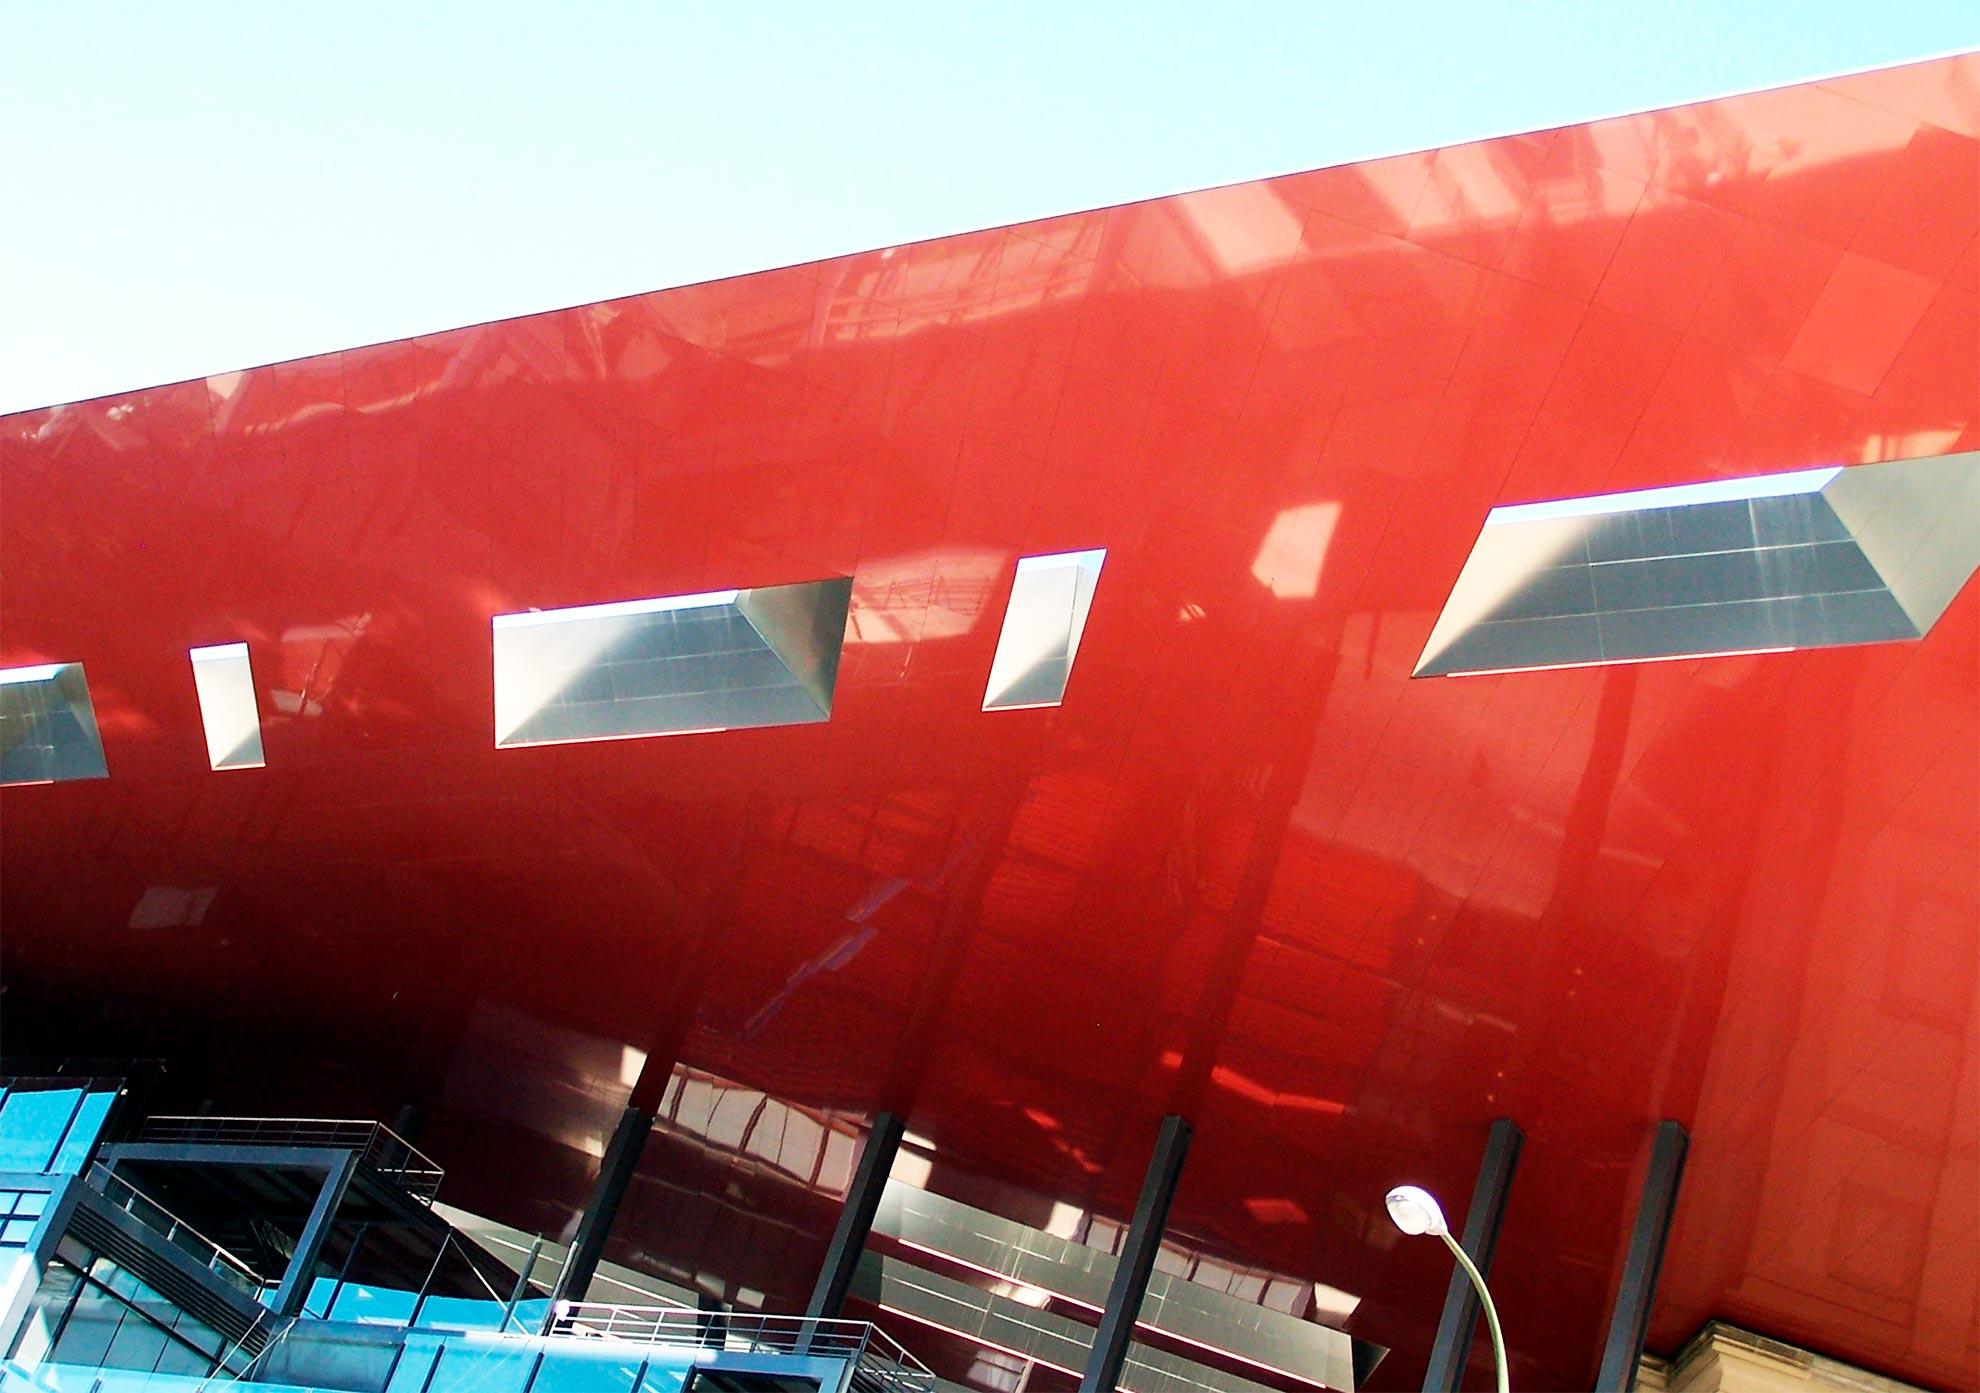 Museo-Reina-Sofia.-Madrid.-Espaa.-larson-inox-1_1592311526.jpg